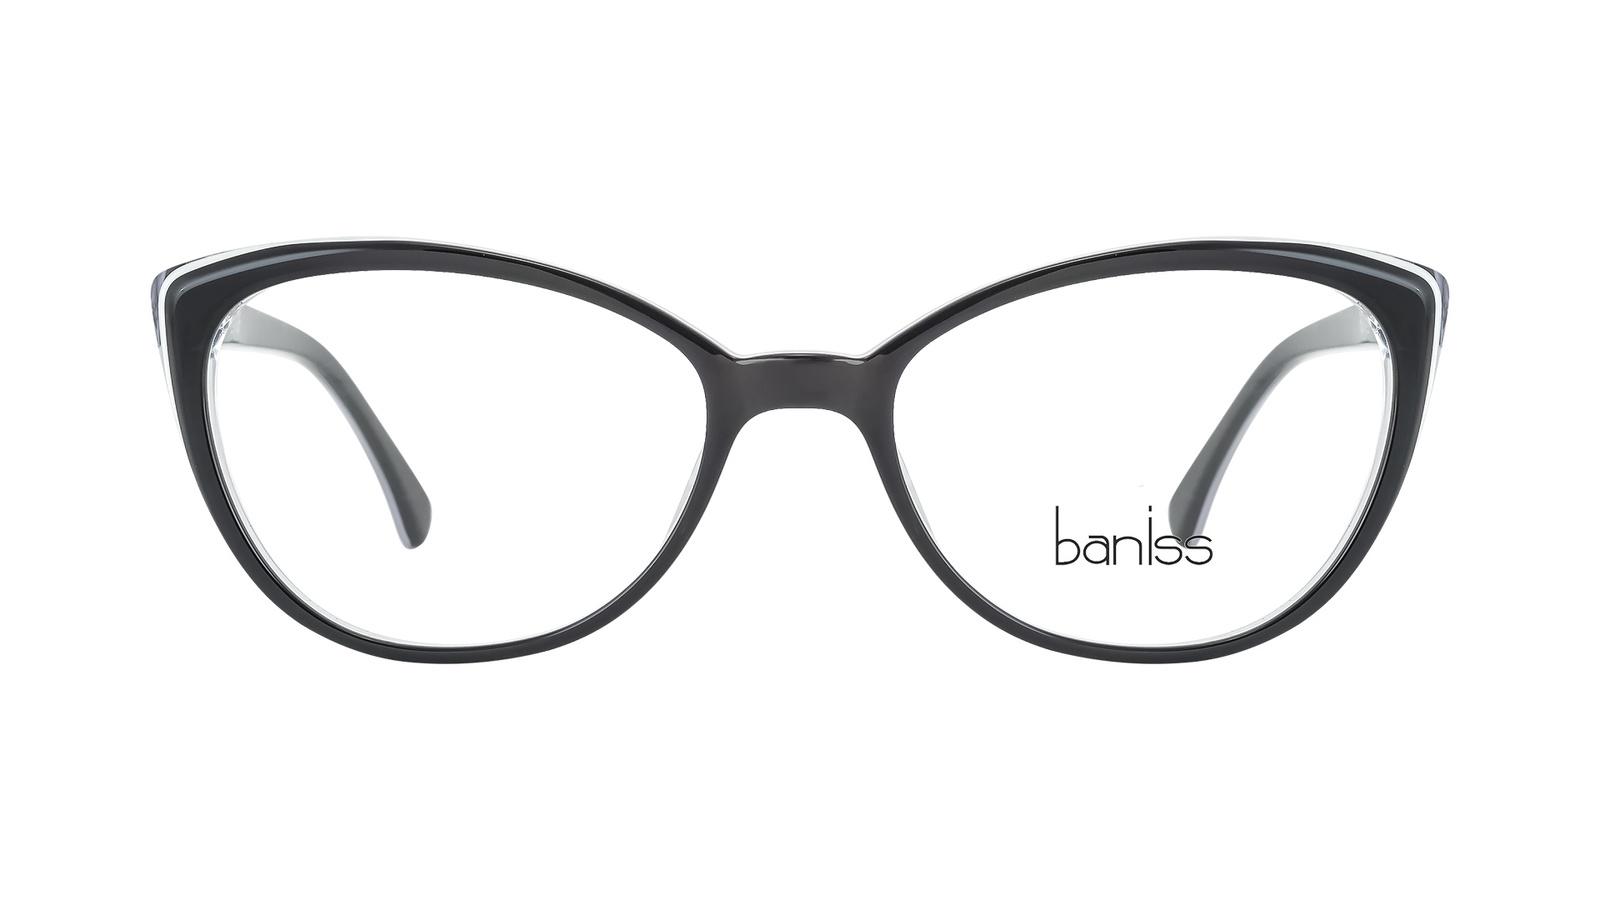 Оправа для очков, BANISS, пластик, BS7010 C01